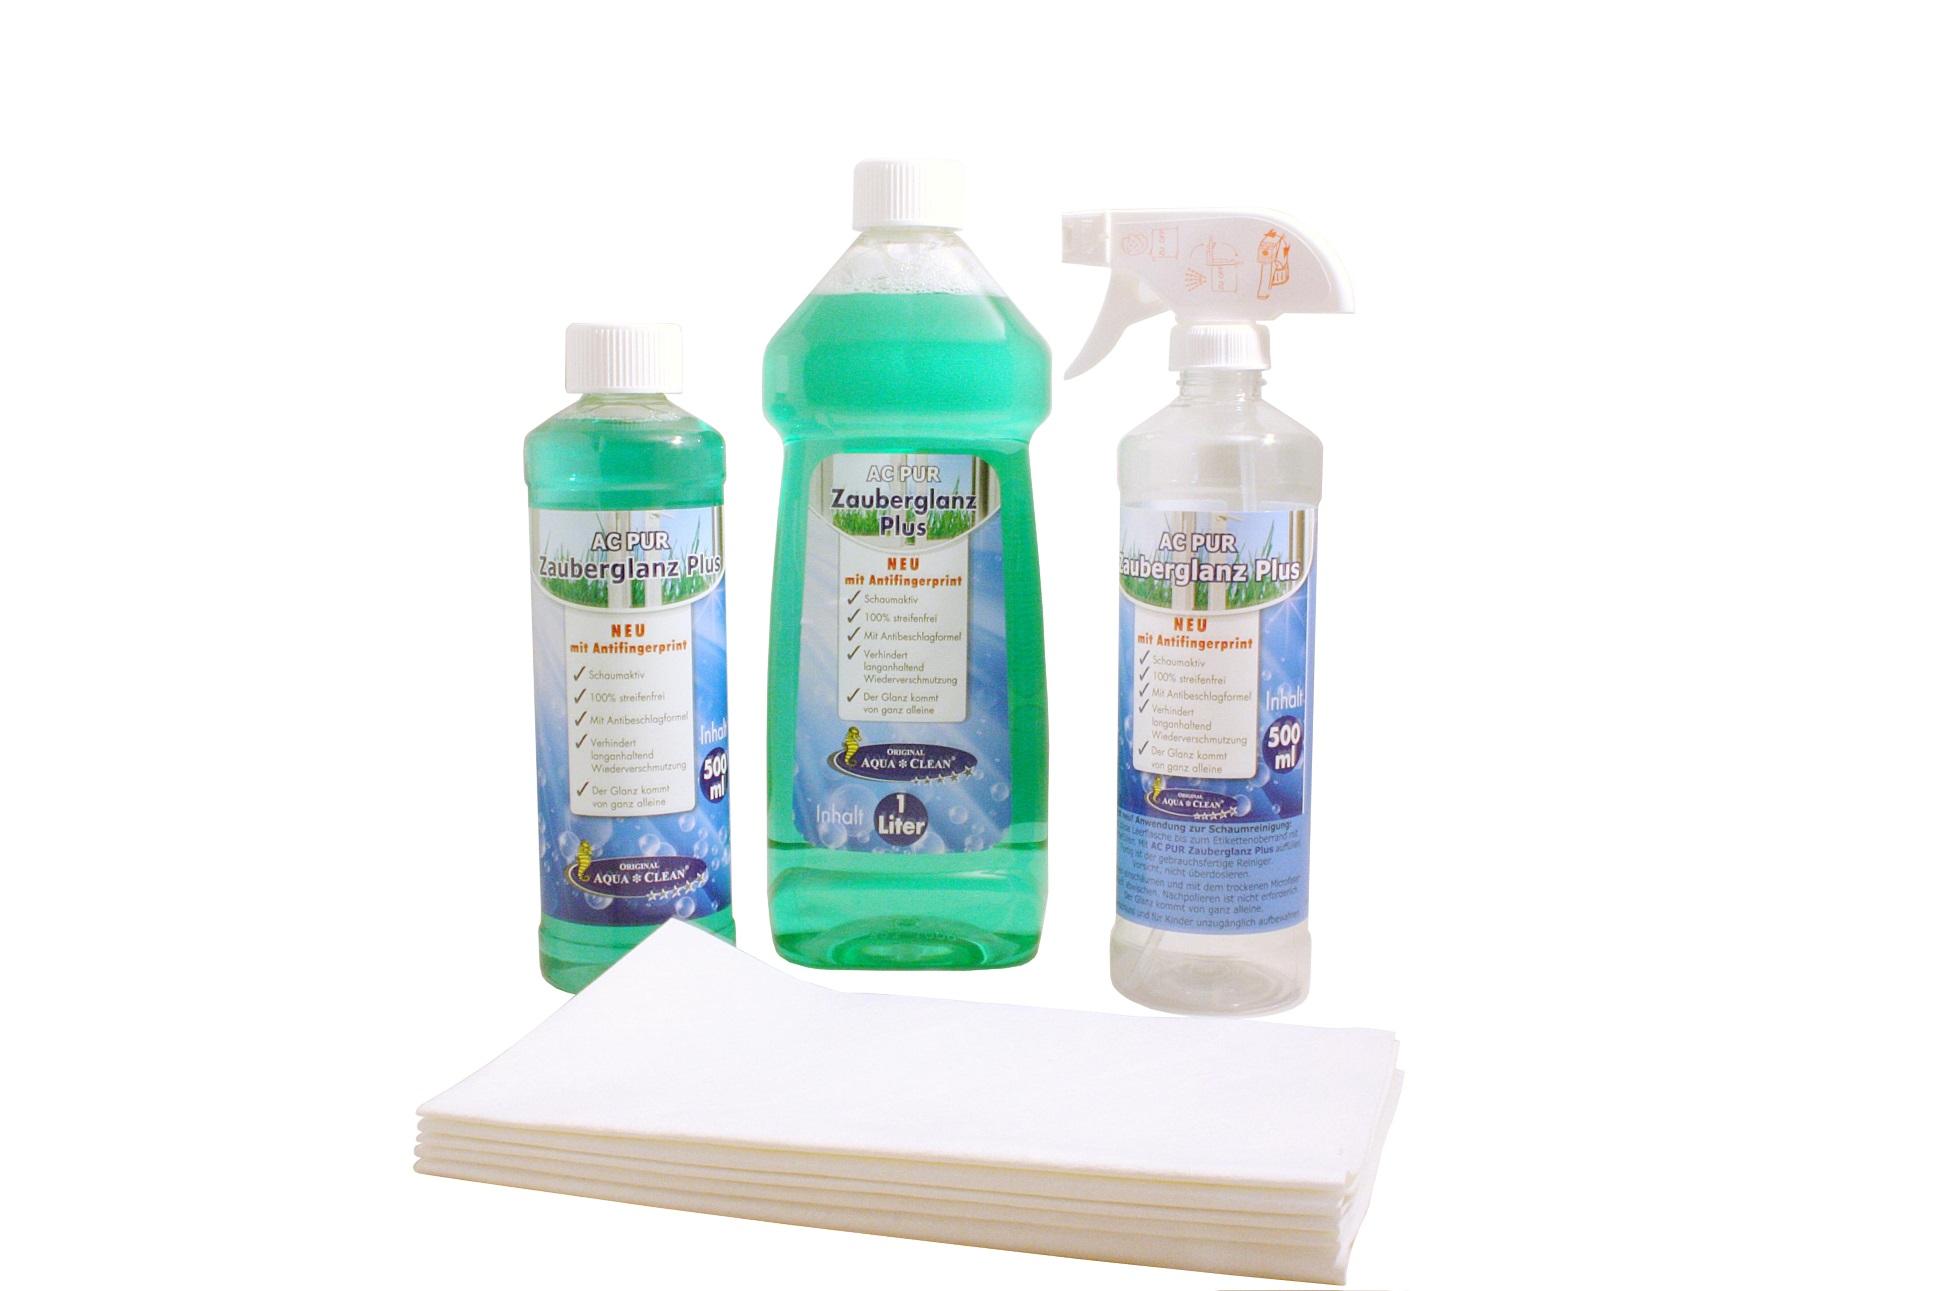 aqua clean pur zauberglanz fensterreiniger anti fingerprint inkl t cher 8tlg aqua clean. Black Bedroom Furniture Sets. Home Design Ideas